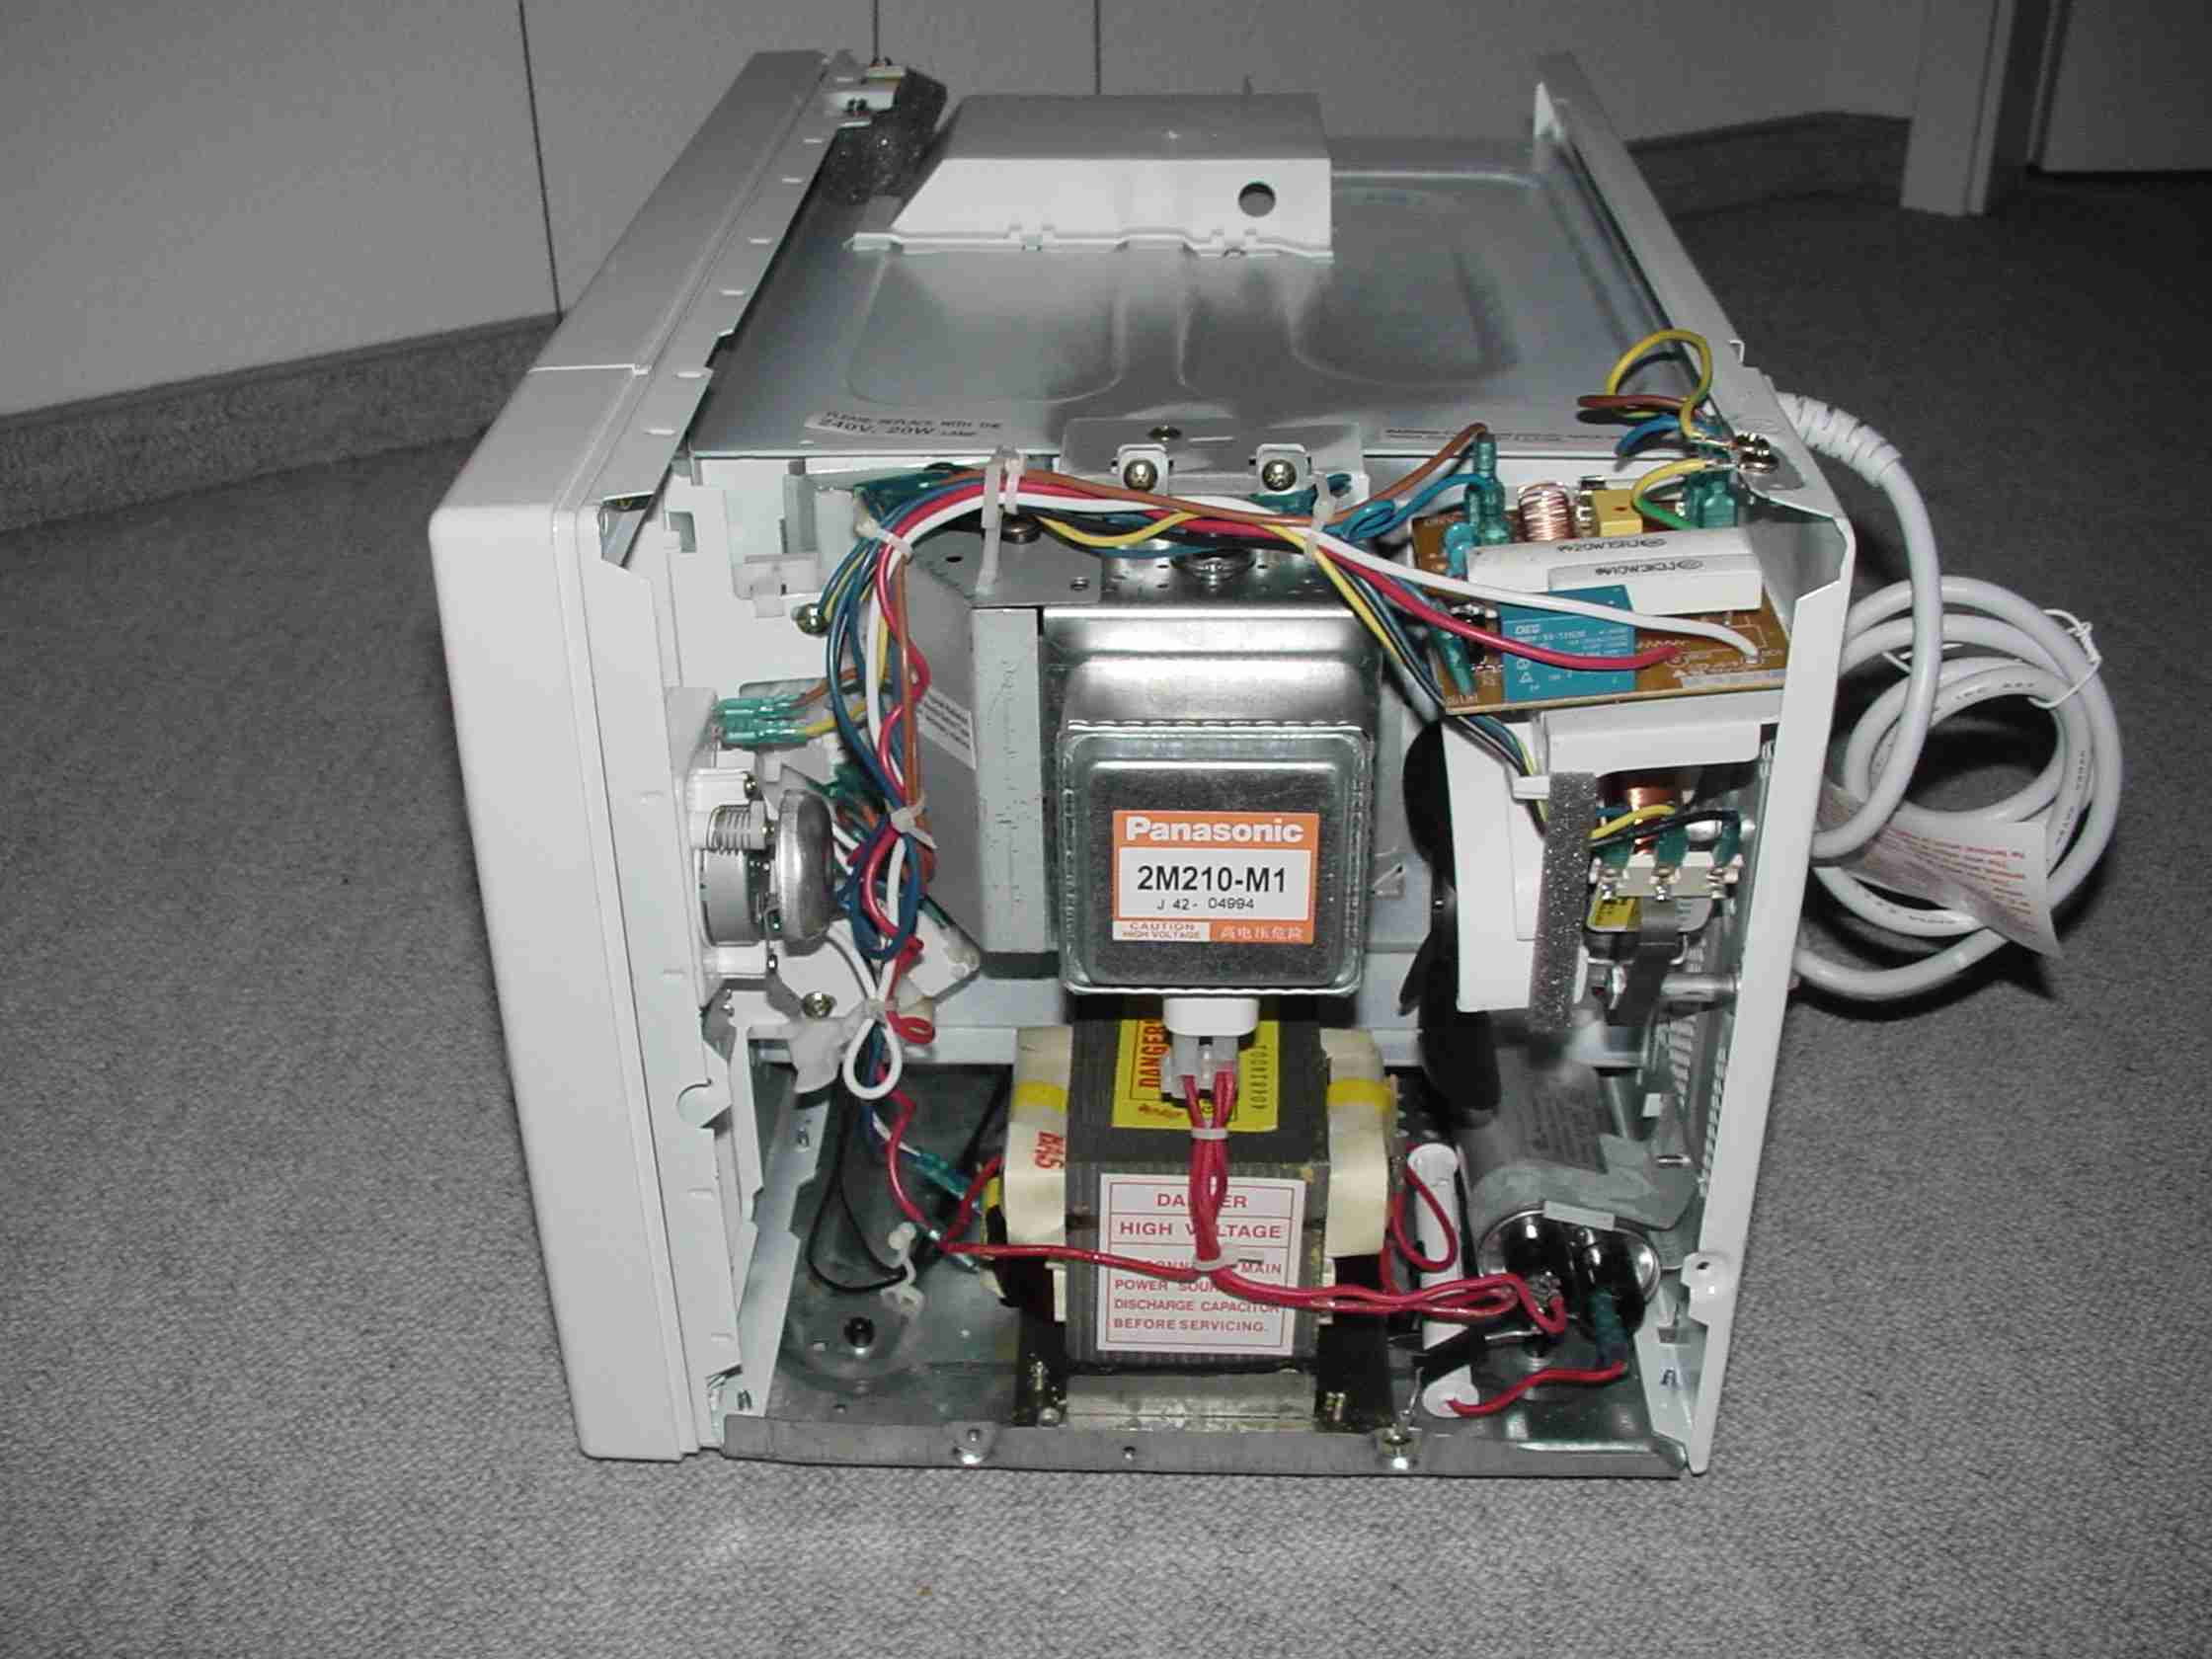 Mikrowellentrafos MOT